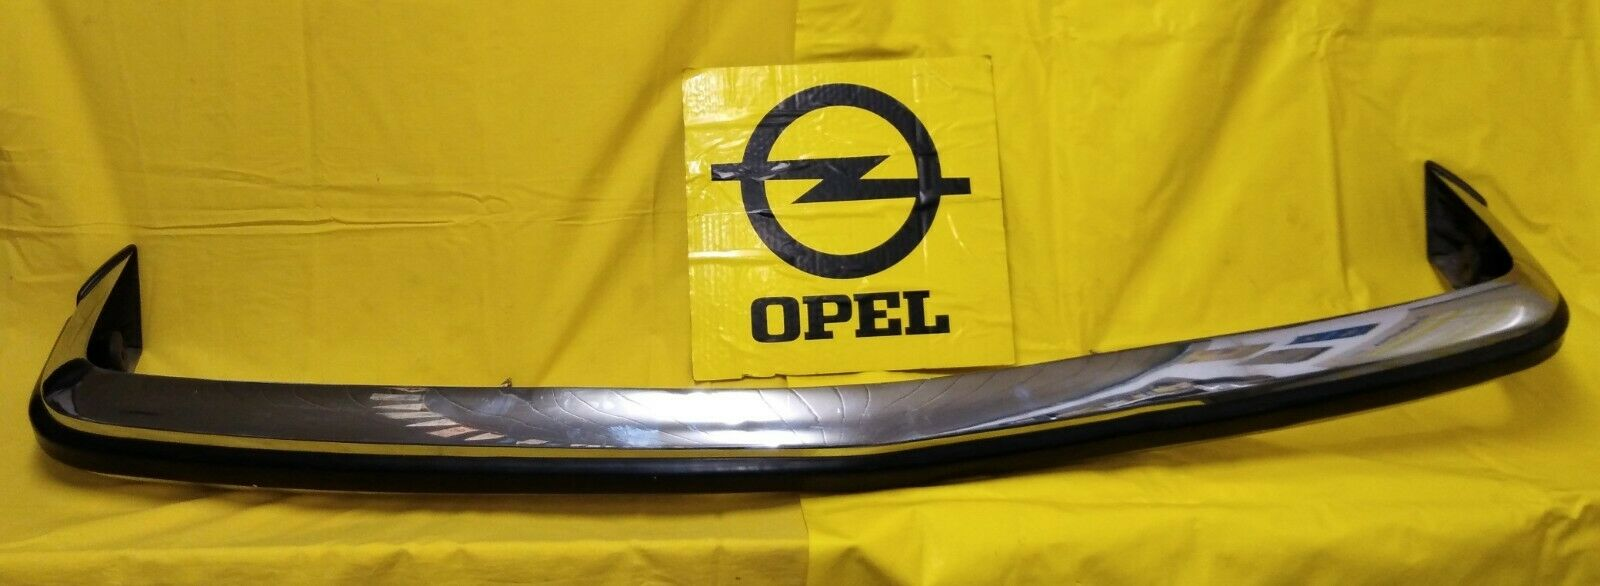 NEU ORIGINAL OPEL Vectra A Dichtung Heckscheibe Heckscheibengummi 4x4 V6 NOS